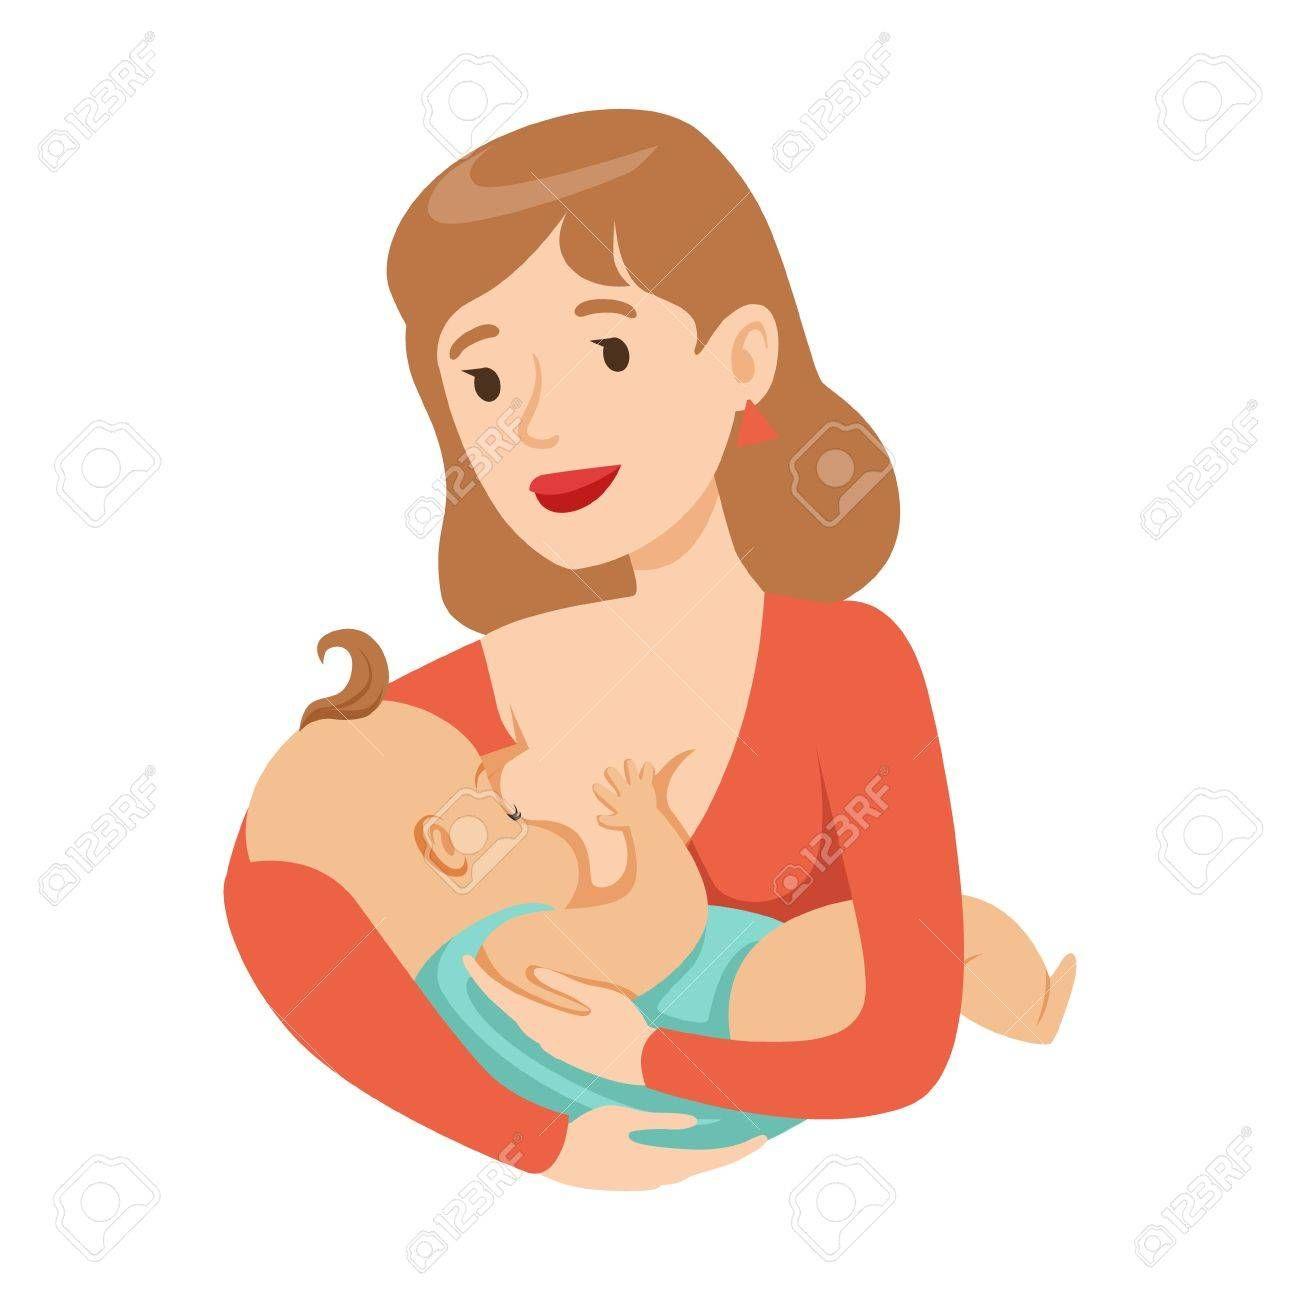 Dibujo De Madre Lactando Buscar Con Google Madre Libros Gratis Lactancia